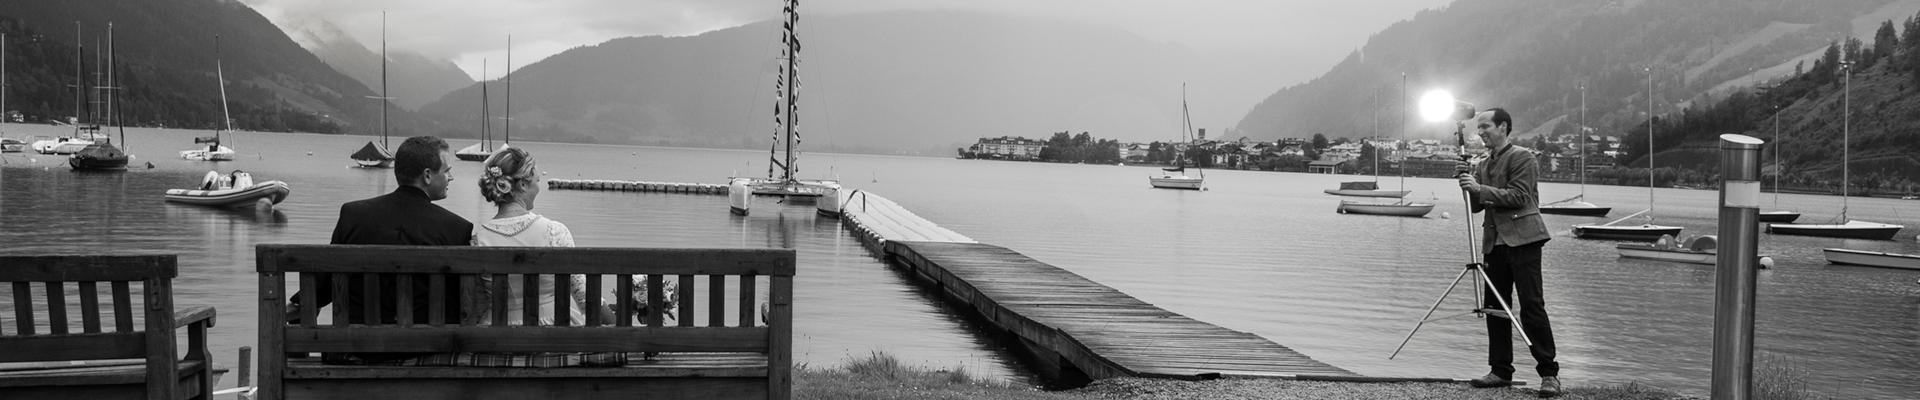 Fotografie Gutschi